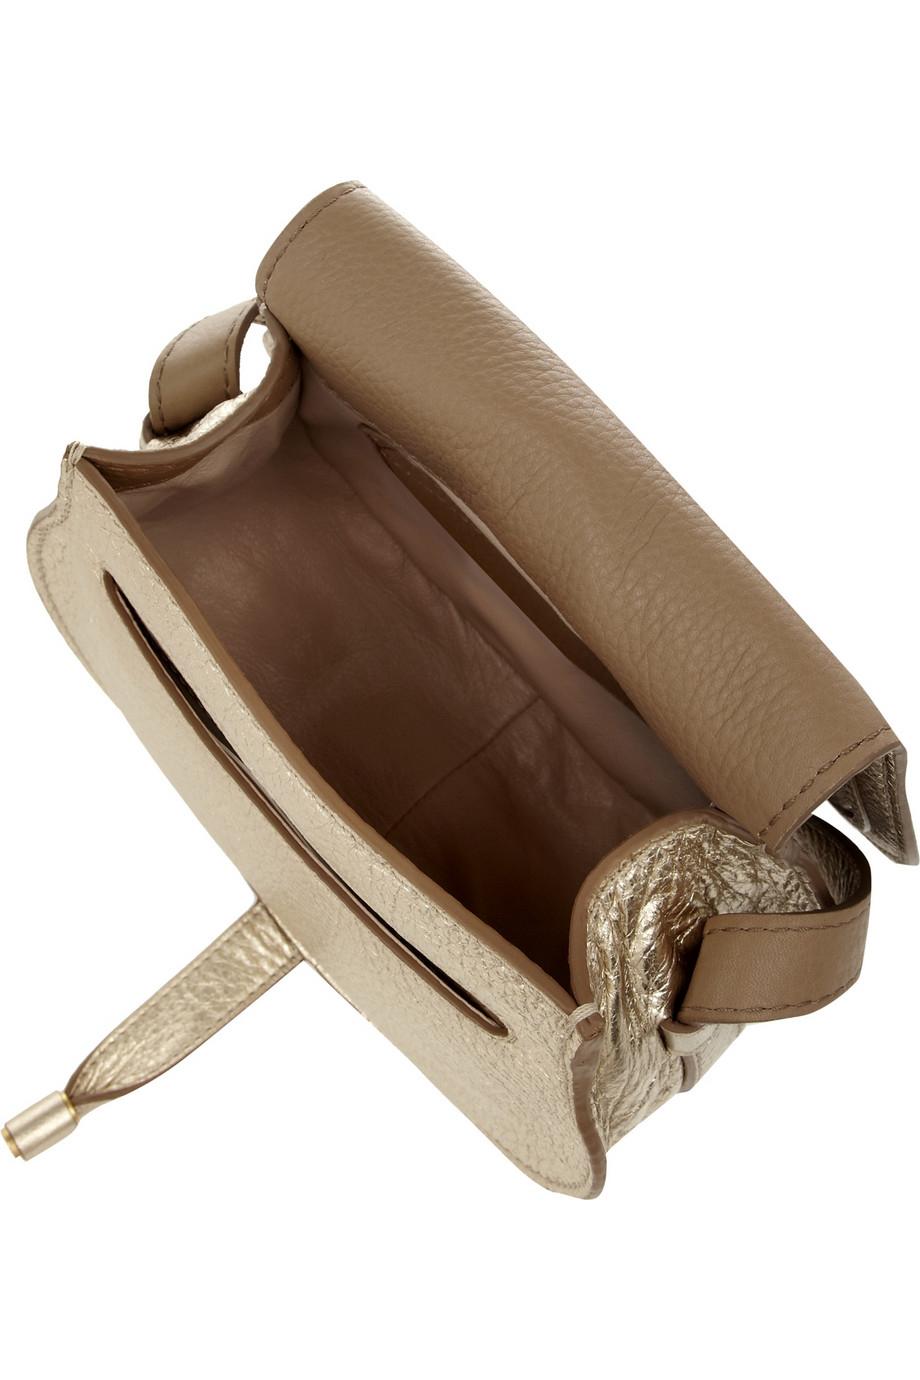 Chlo¨¦ The Marcie Mini Metallic Texturedleather Shoulder Bag in ...